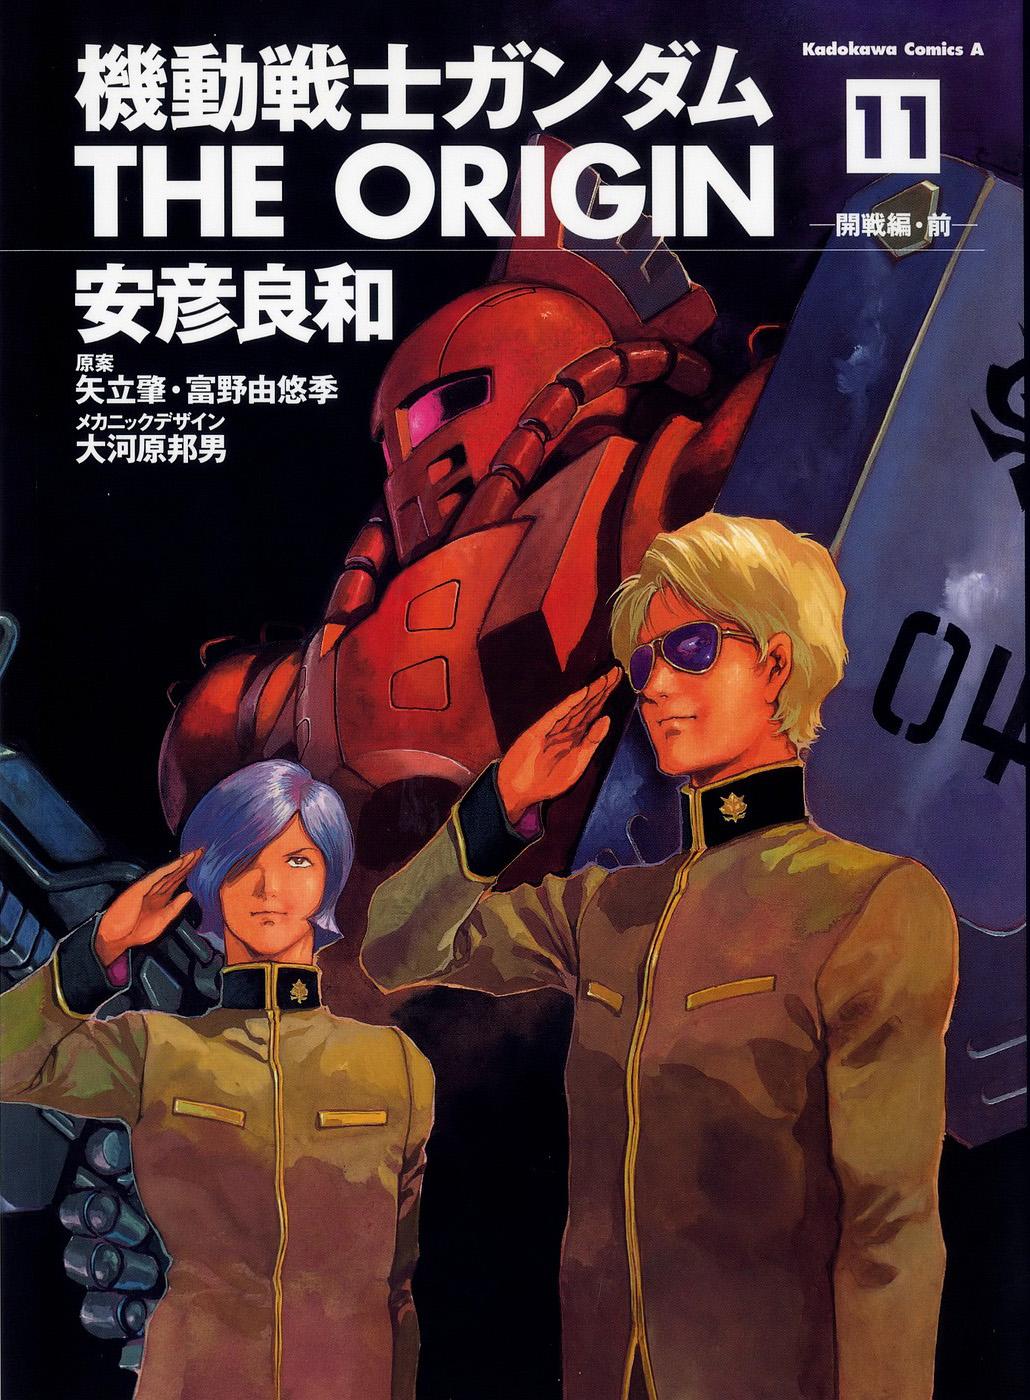 Image - Mobile-suit-gundam-the-origin-11.jpg - Gundam Wiki